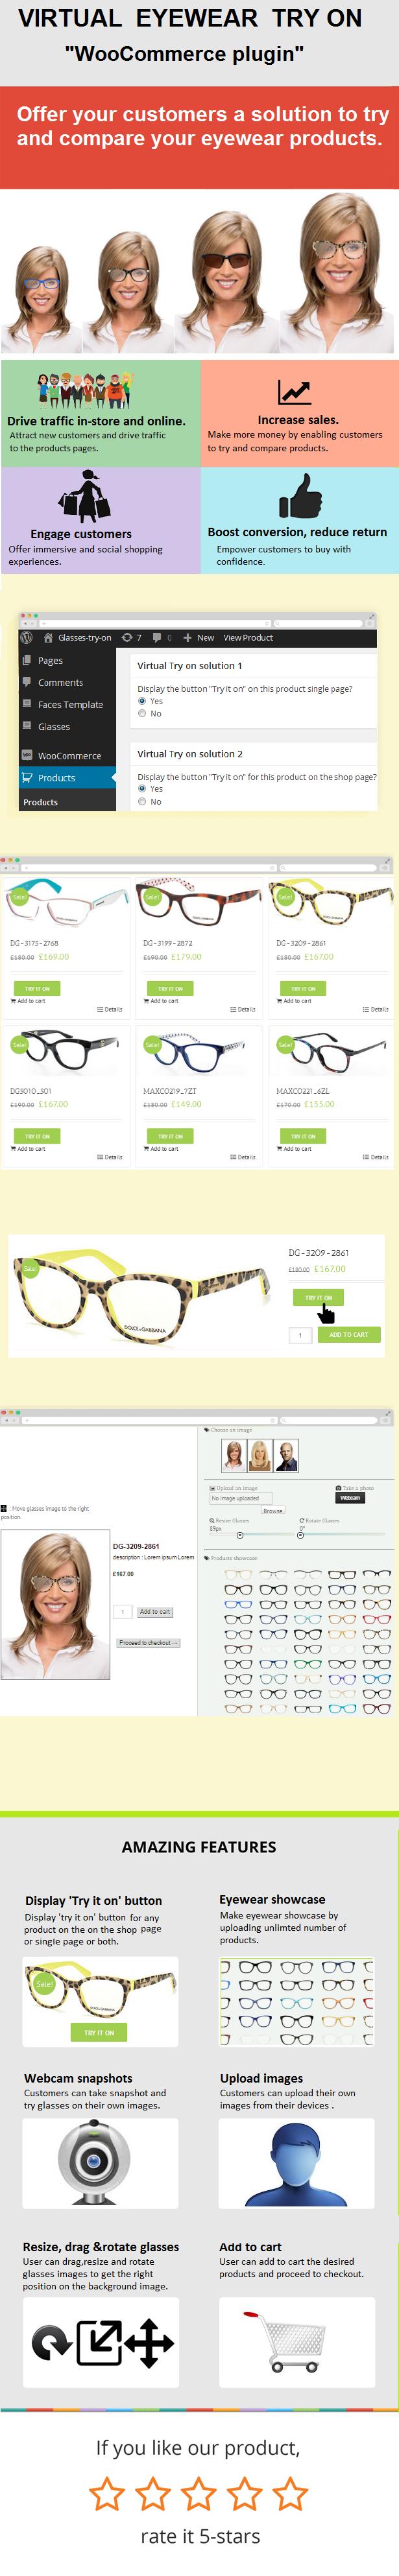 "Eyewear Virtual Try-on ""WooCommerce plugin"" - 1"